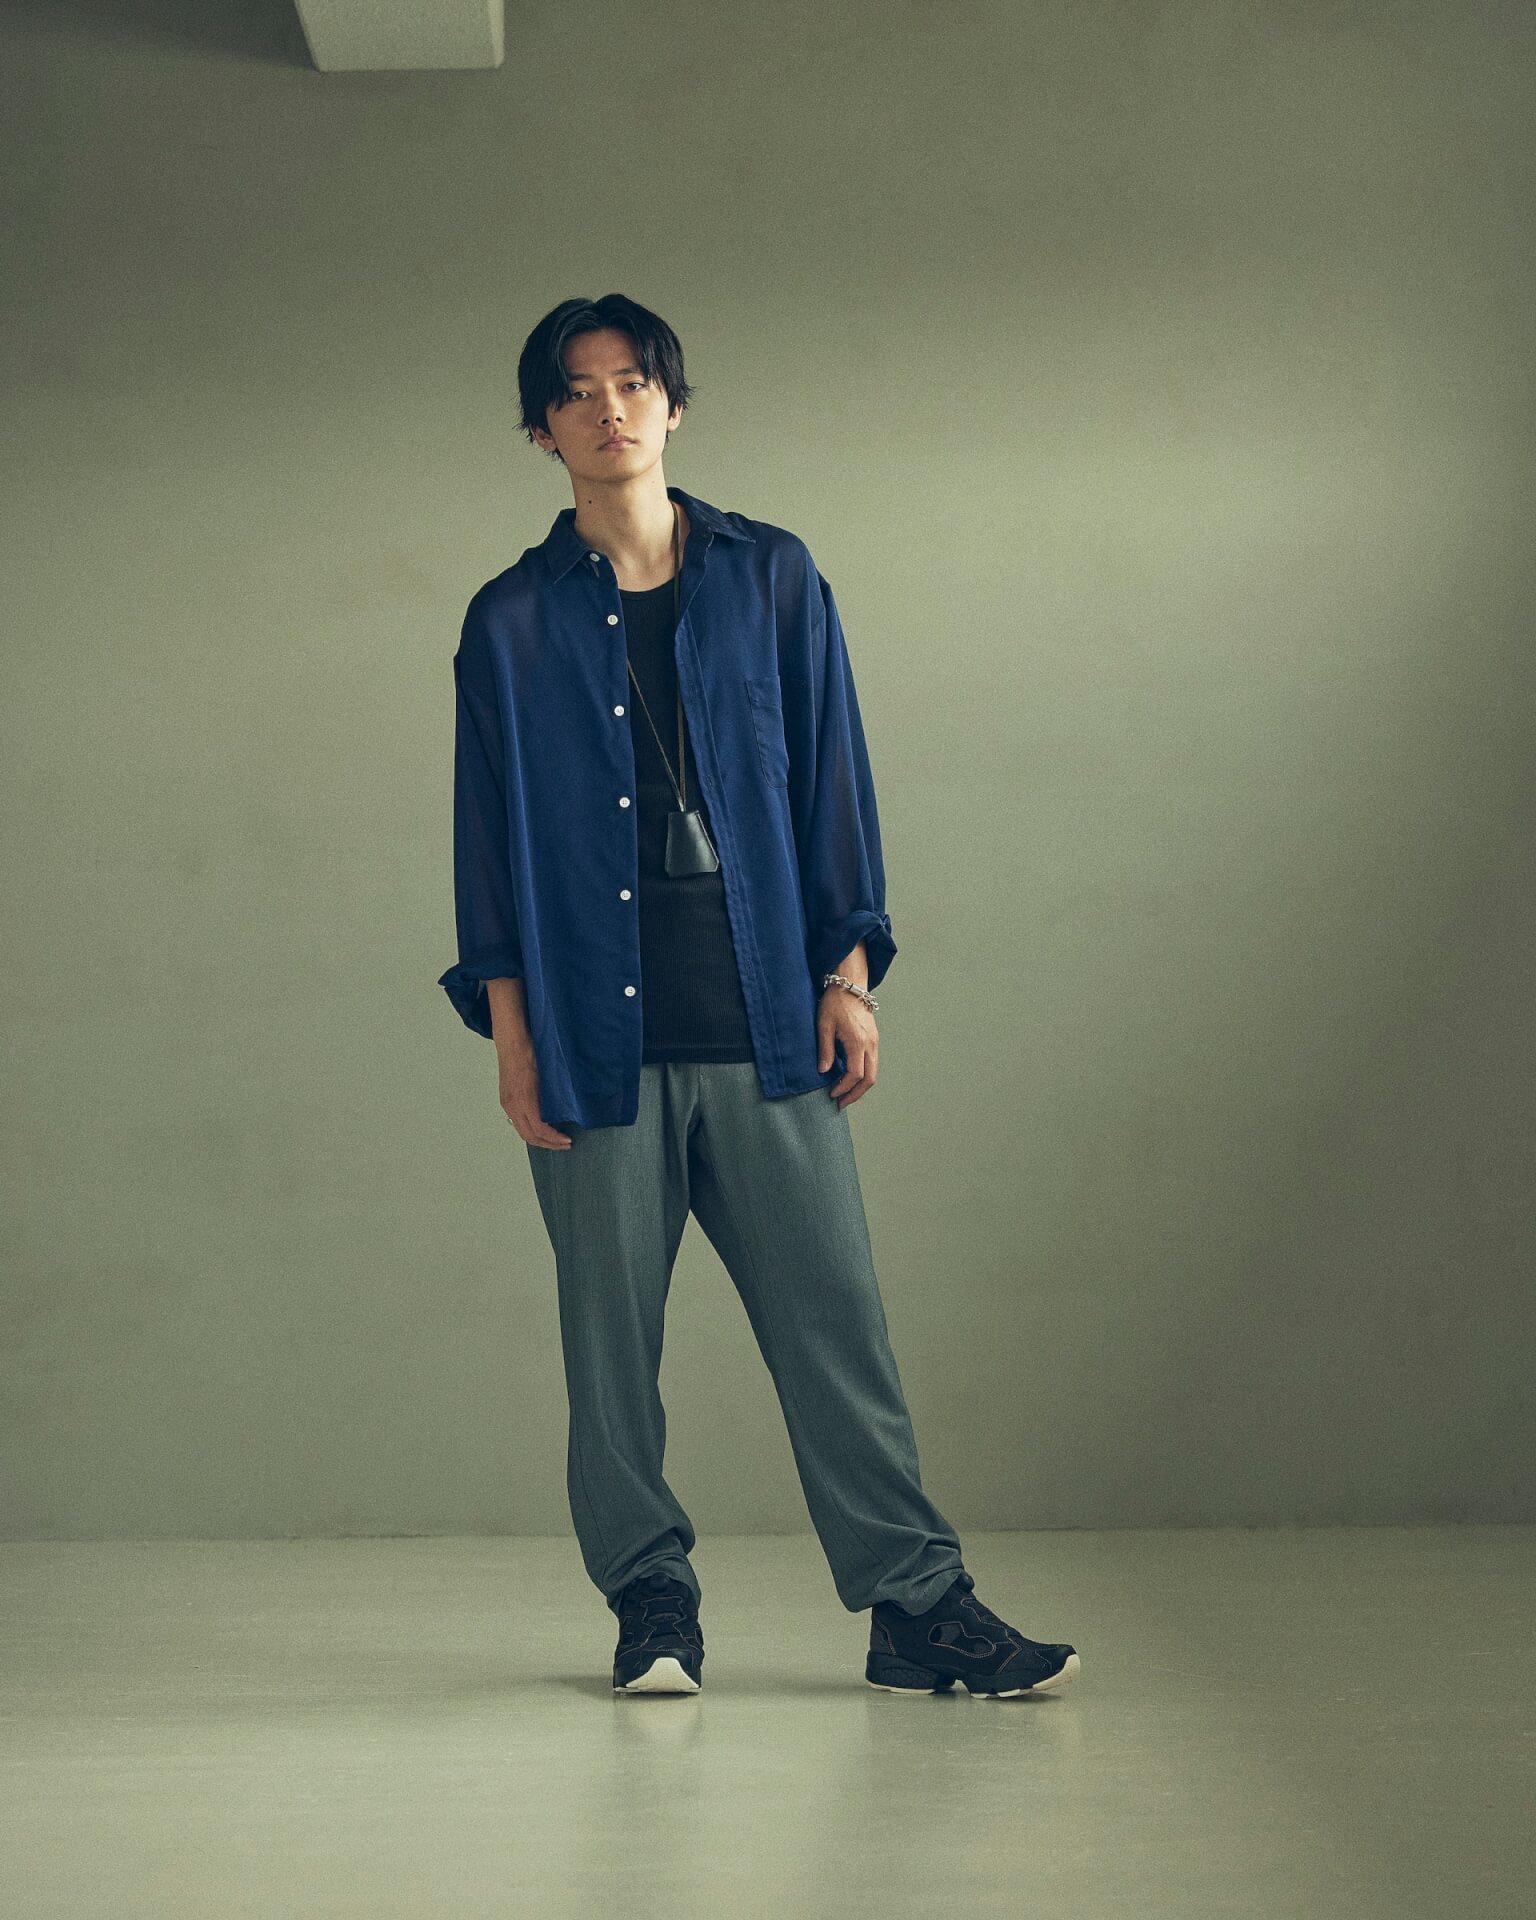 ReebokからリアルなデニムをイメージしたINSTAPUMP FURYの「DENIM PACK」が発売!櫻井海音とアンジュルム佐々木莉佳子がルックに登場 Fashion_210719_denimpack13